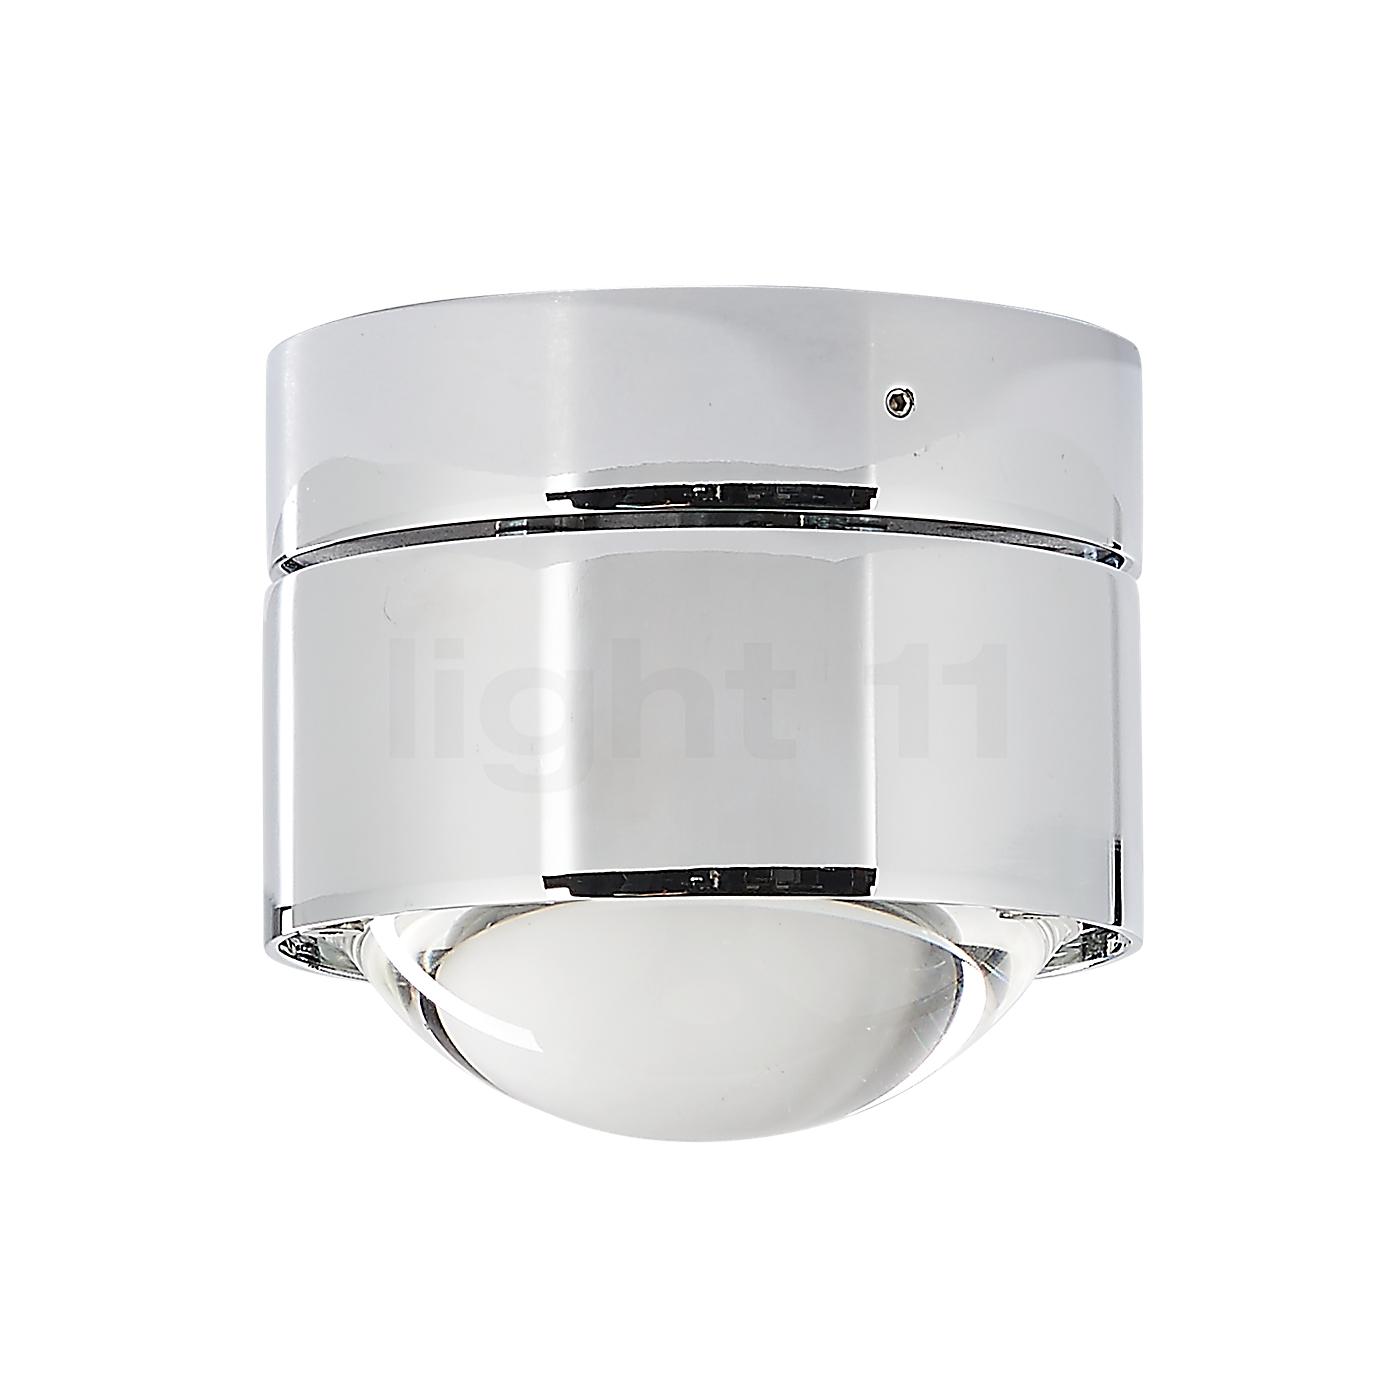 top light puk plus plafondlamp kopen op. Black Bedroom Furniture Sets. Home Design Ideas